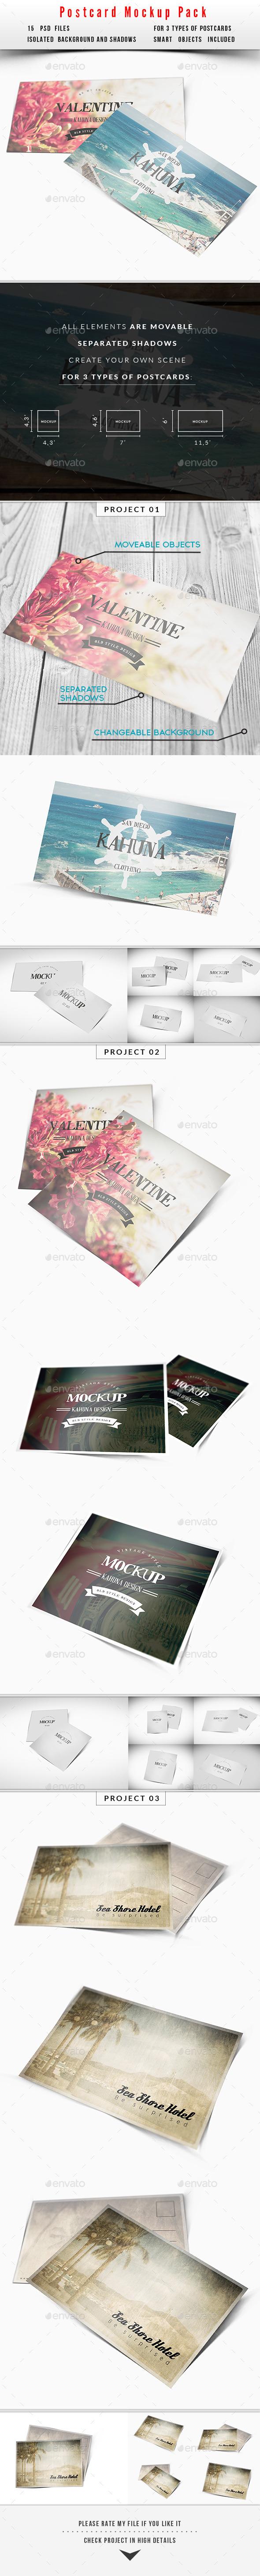 GraphicRiver Postcard Invitation Mockup Pack 10534707